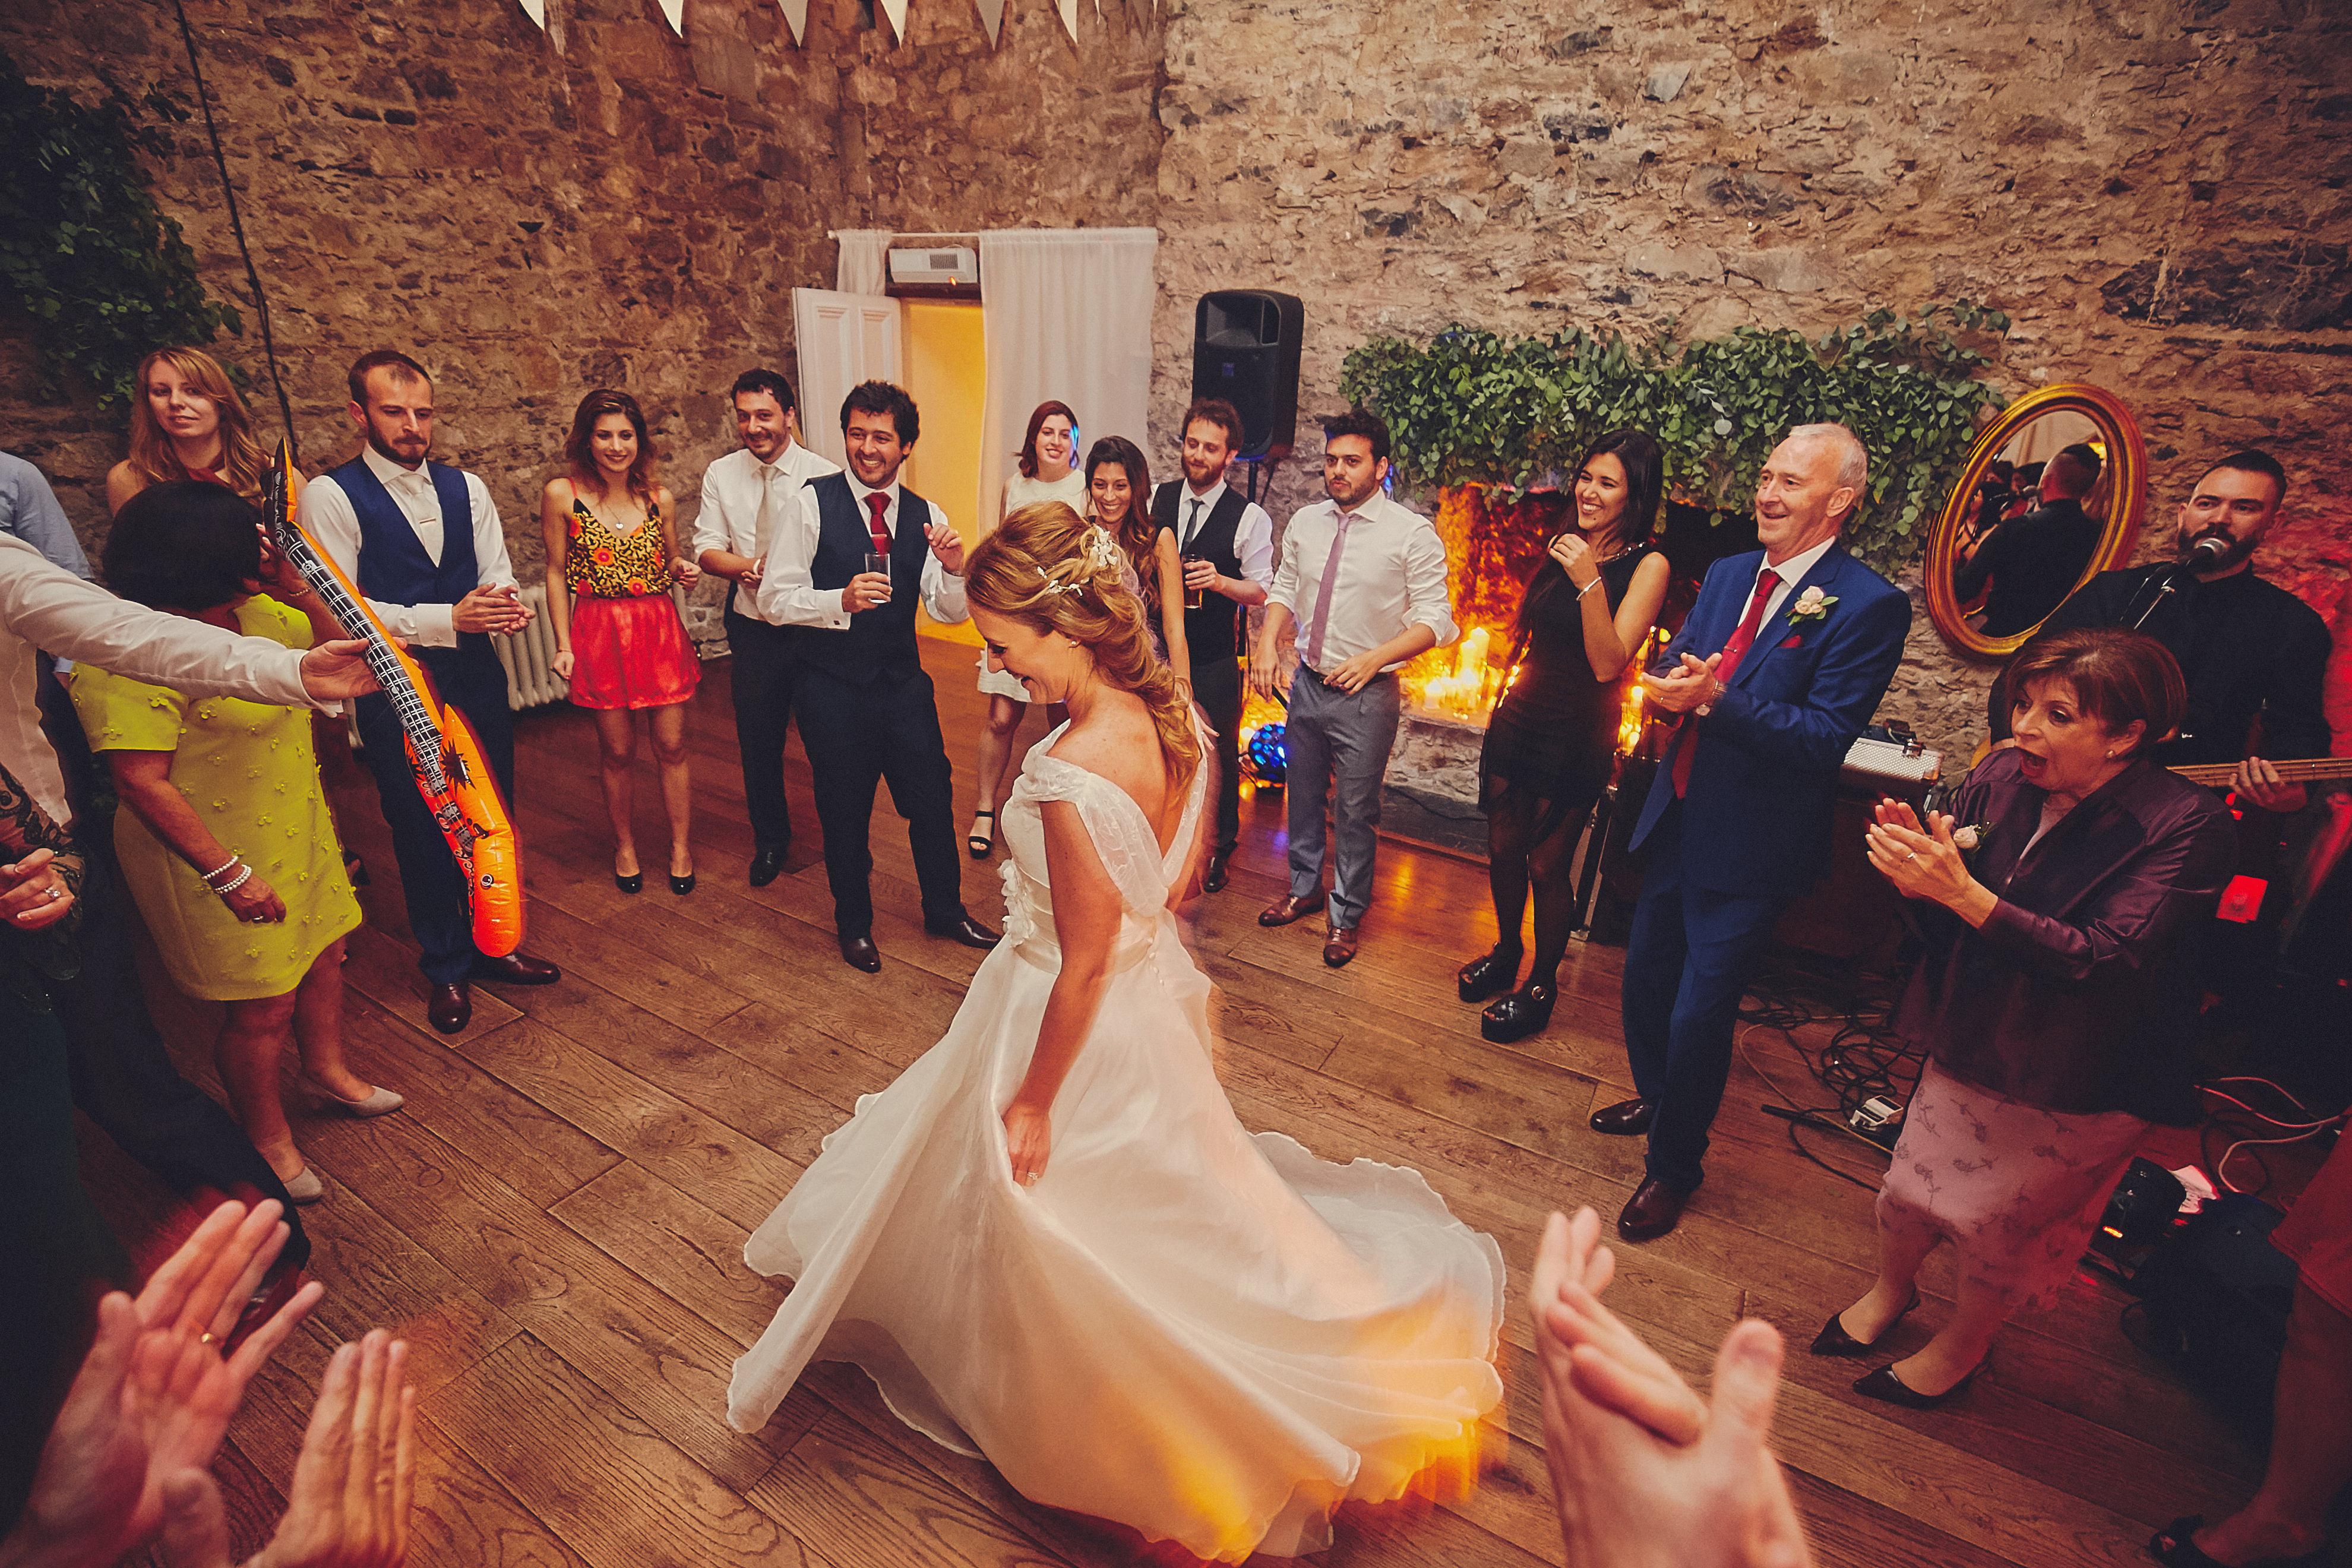 Cloughjordan House weddding160 - Cloughjordan House Wedding - Alternative Venue